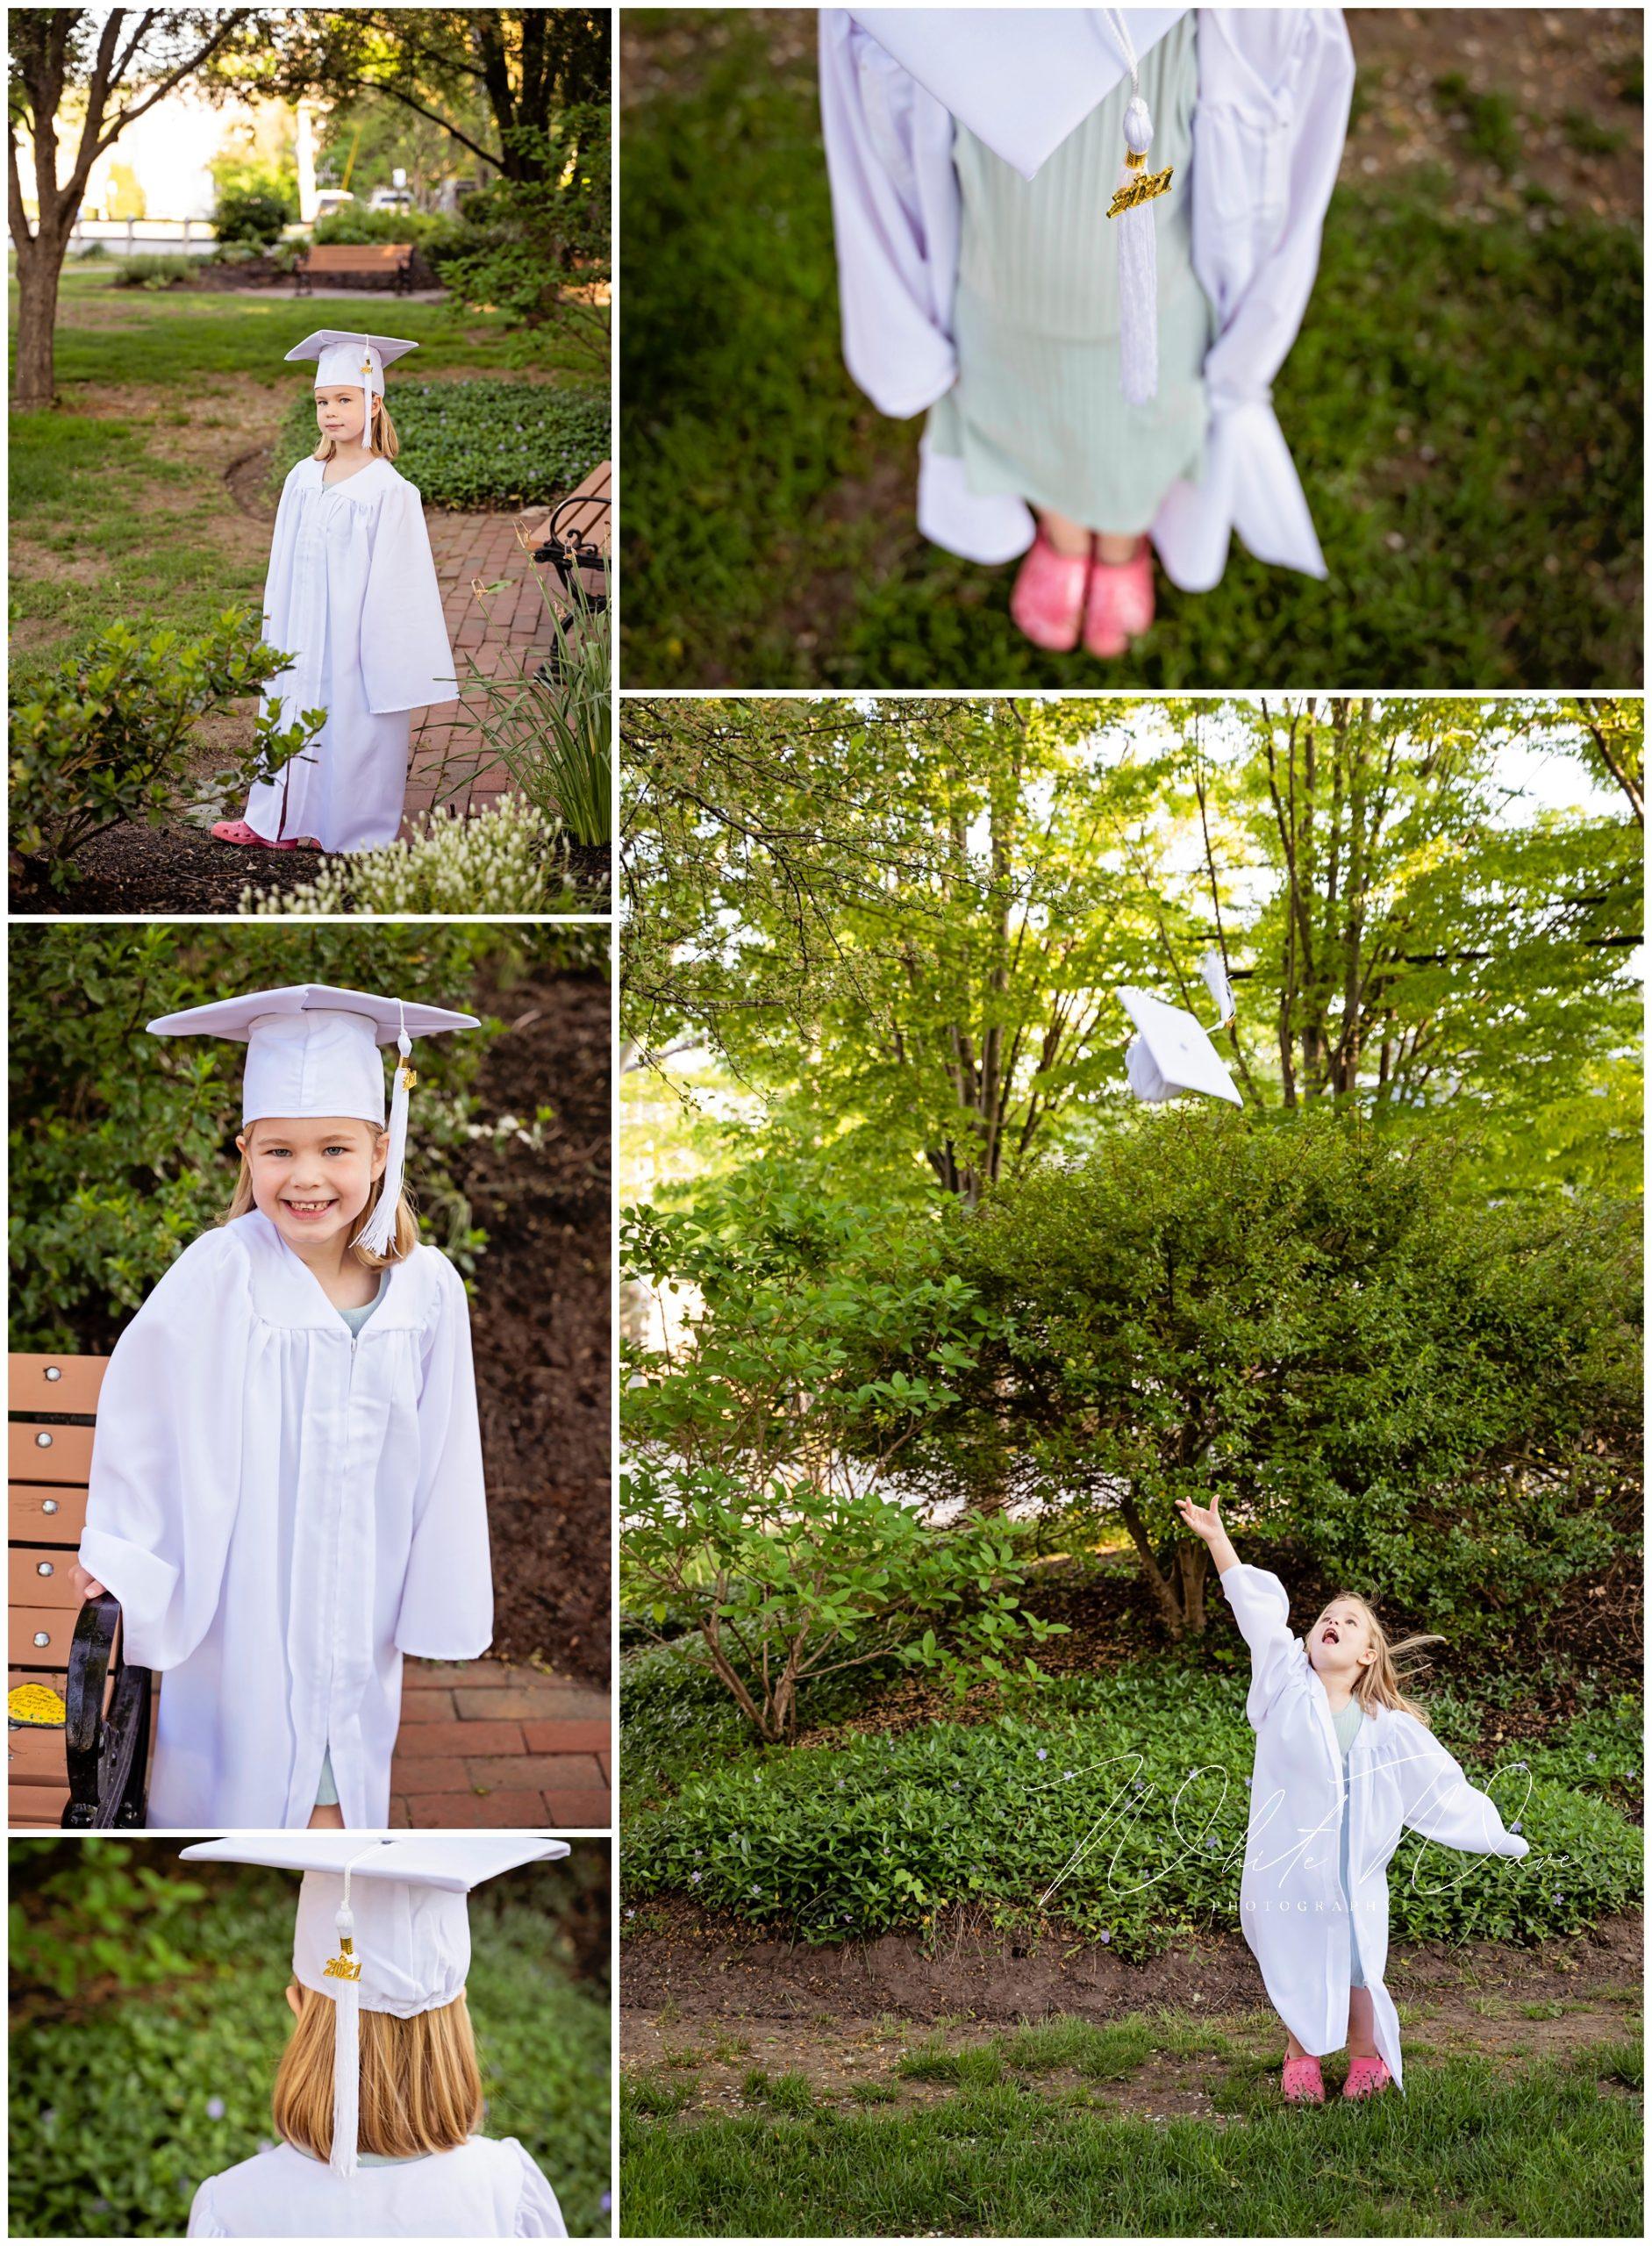 Pre-school & Kindergarten Cap & Gown Photo Sessions in Exeter, New Hampshire